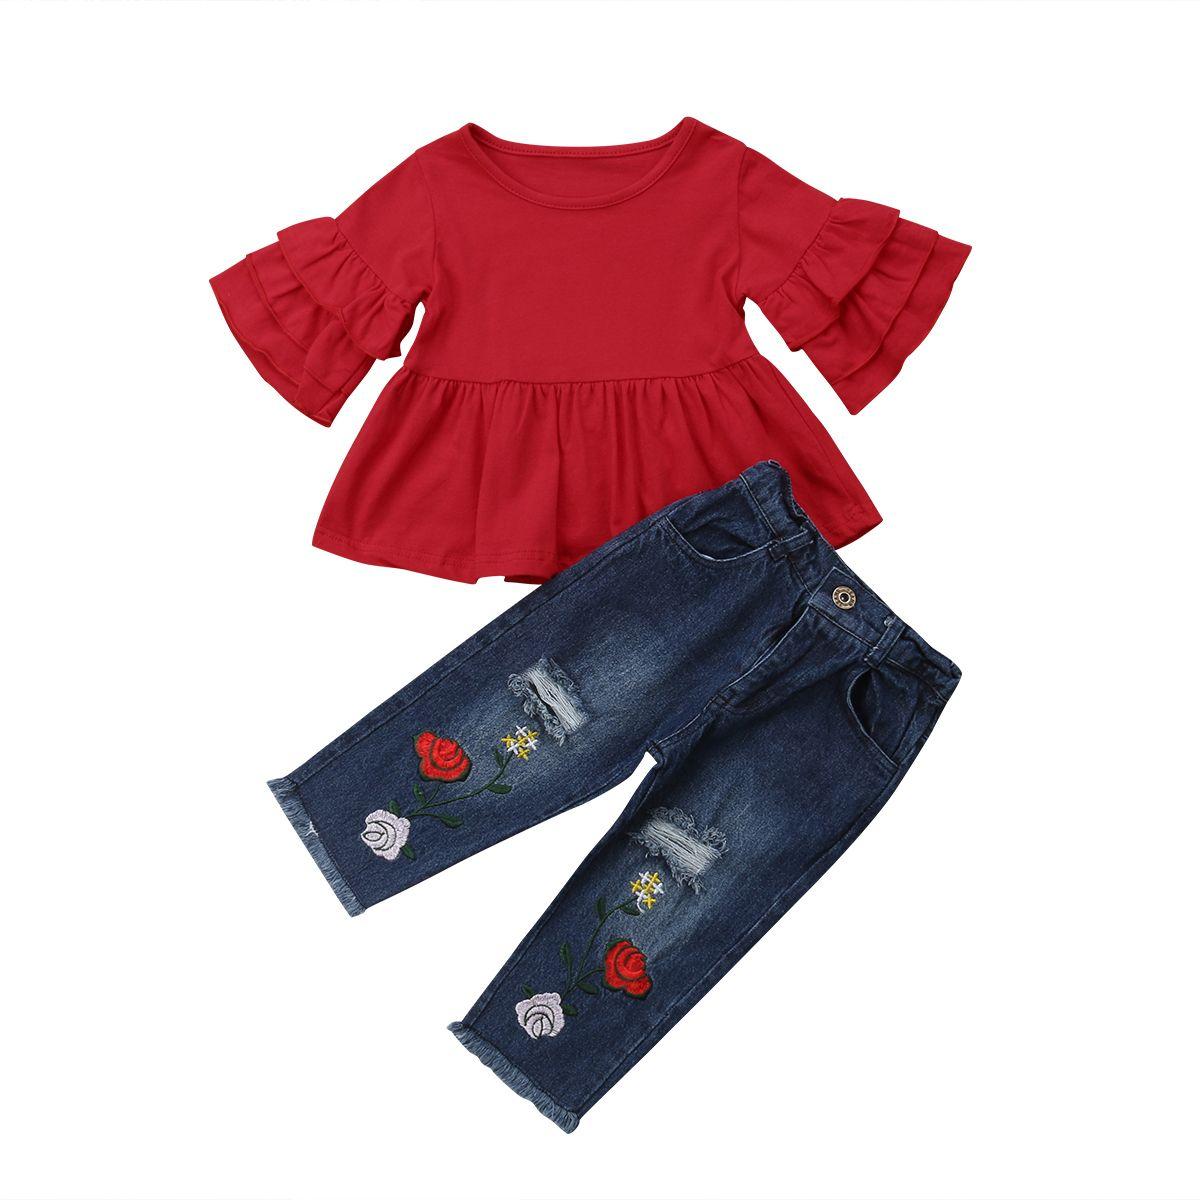 Summer Toddler Kids Baby Girl T-shirt Tops+Long Pants 2PCS Outfits Clothes Set